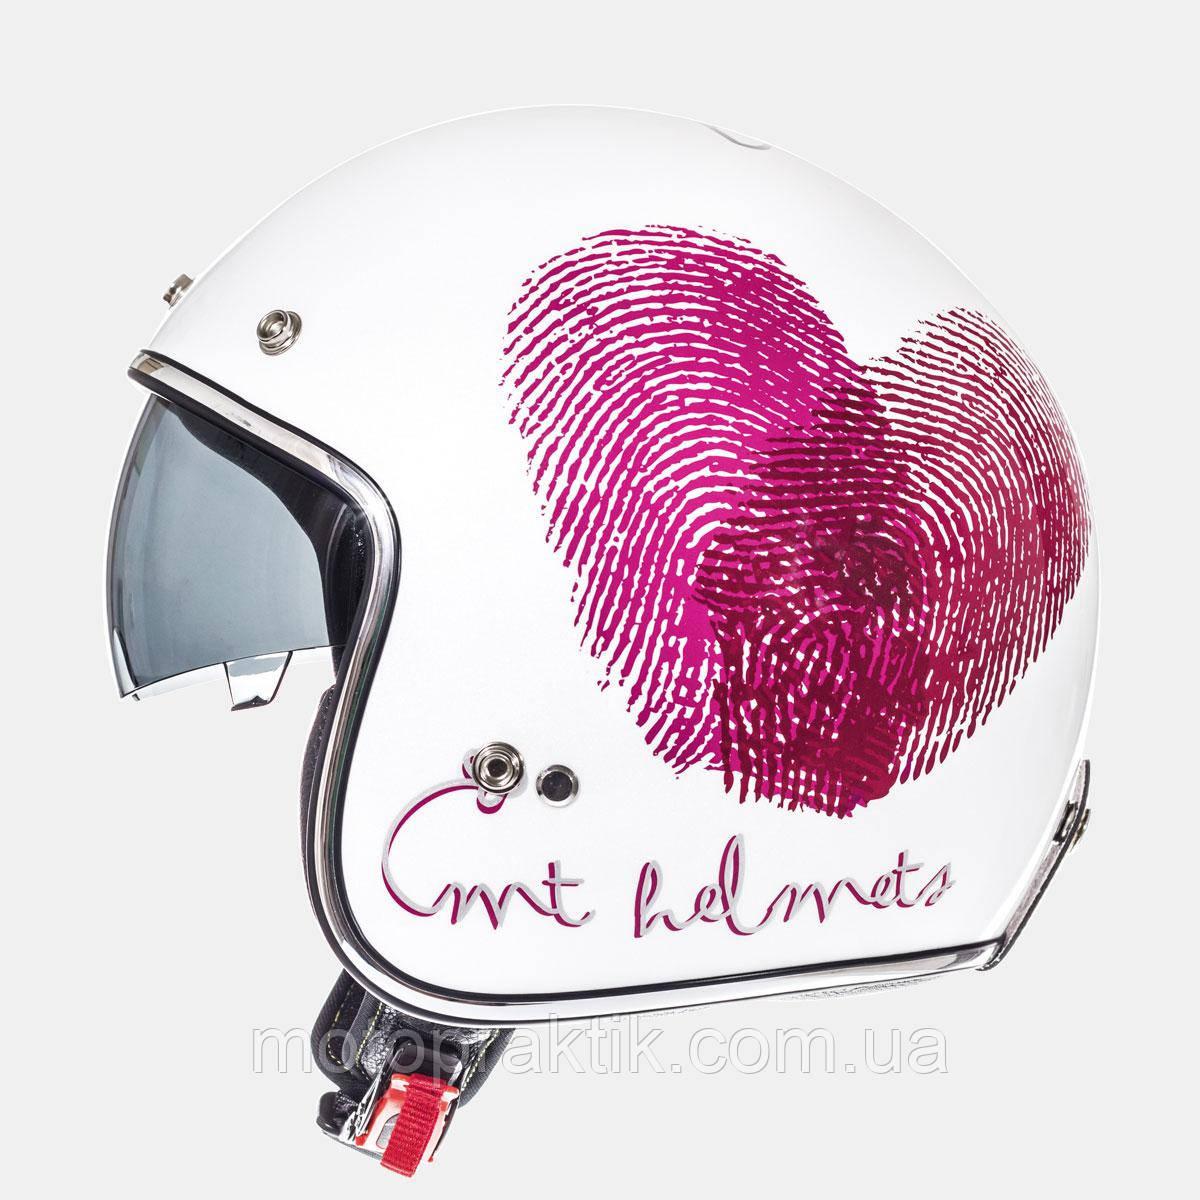 MT LE MANS SV Love Gloss Pearl White Fushia Red, XS, Мотошлем лицевик